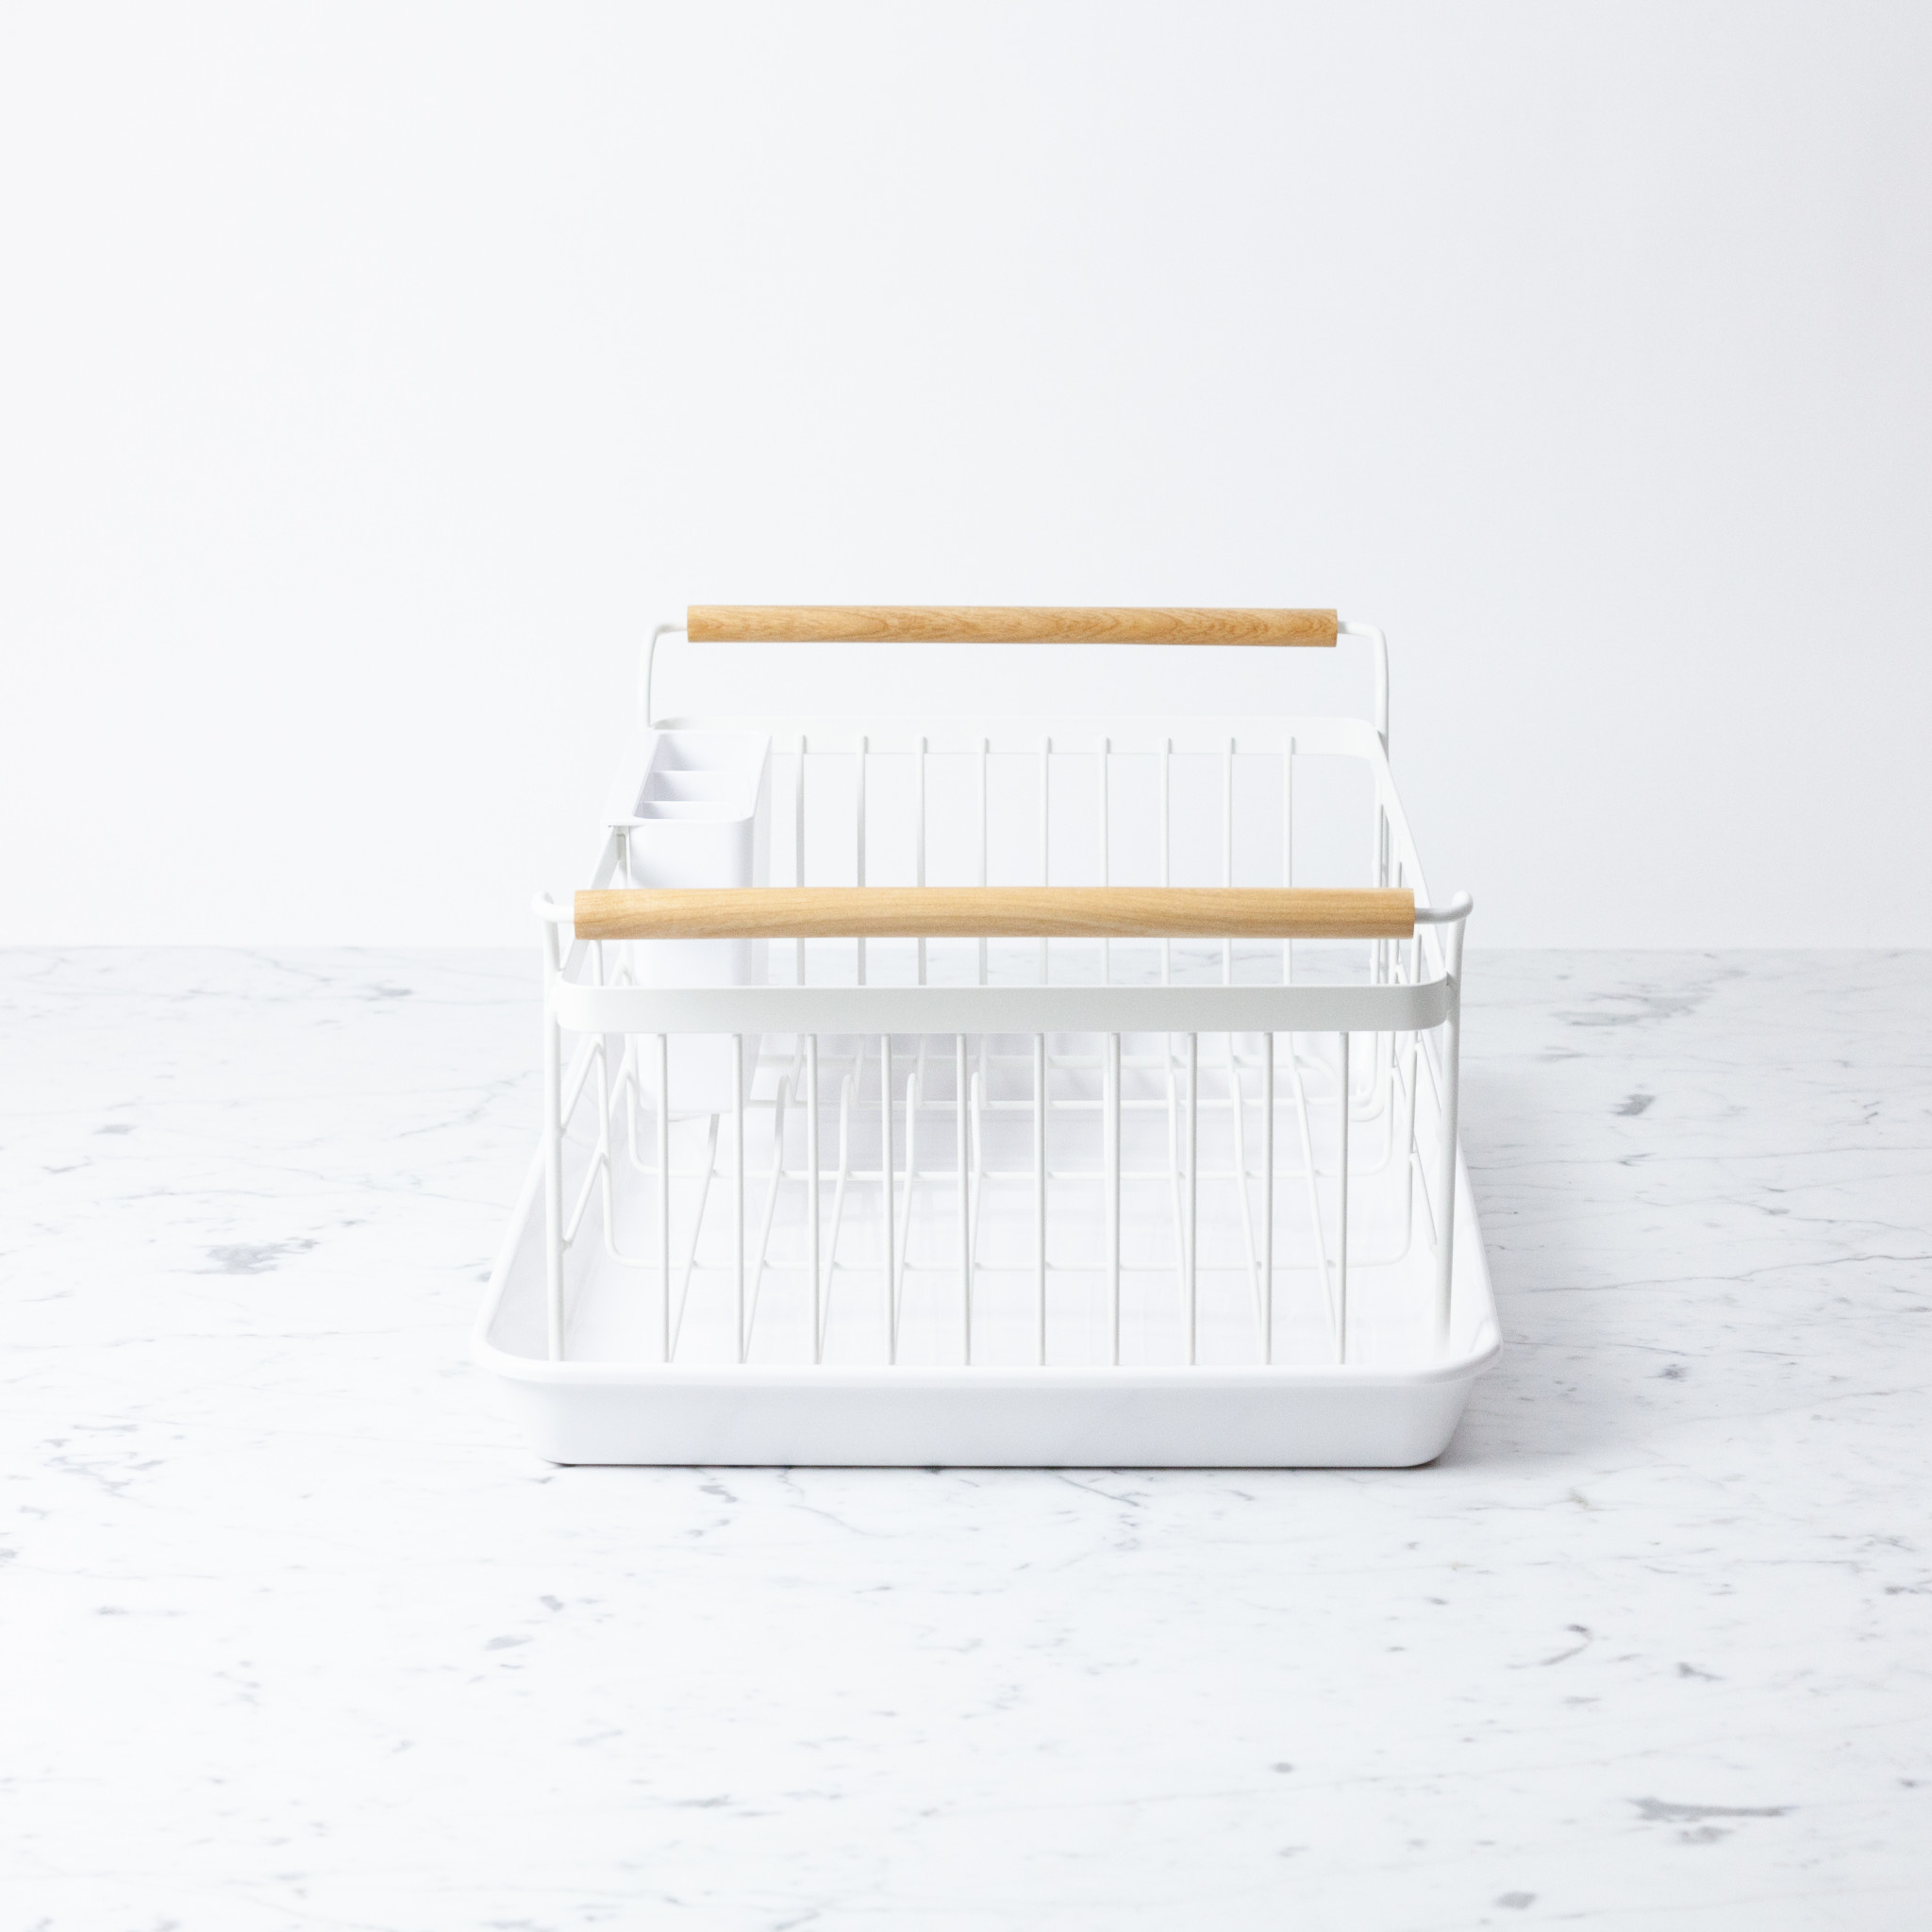 Yamazaki Home Tosca Dish Drainer Rack with Drip Pan and Wood Handles - White